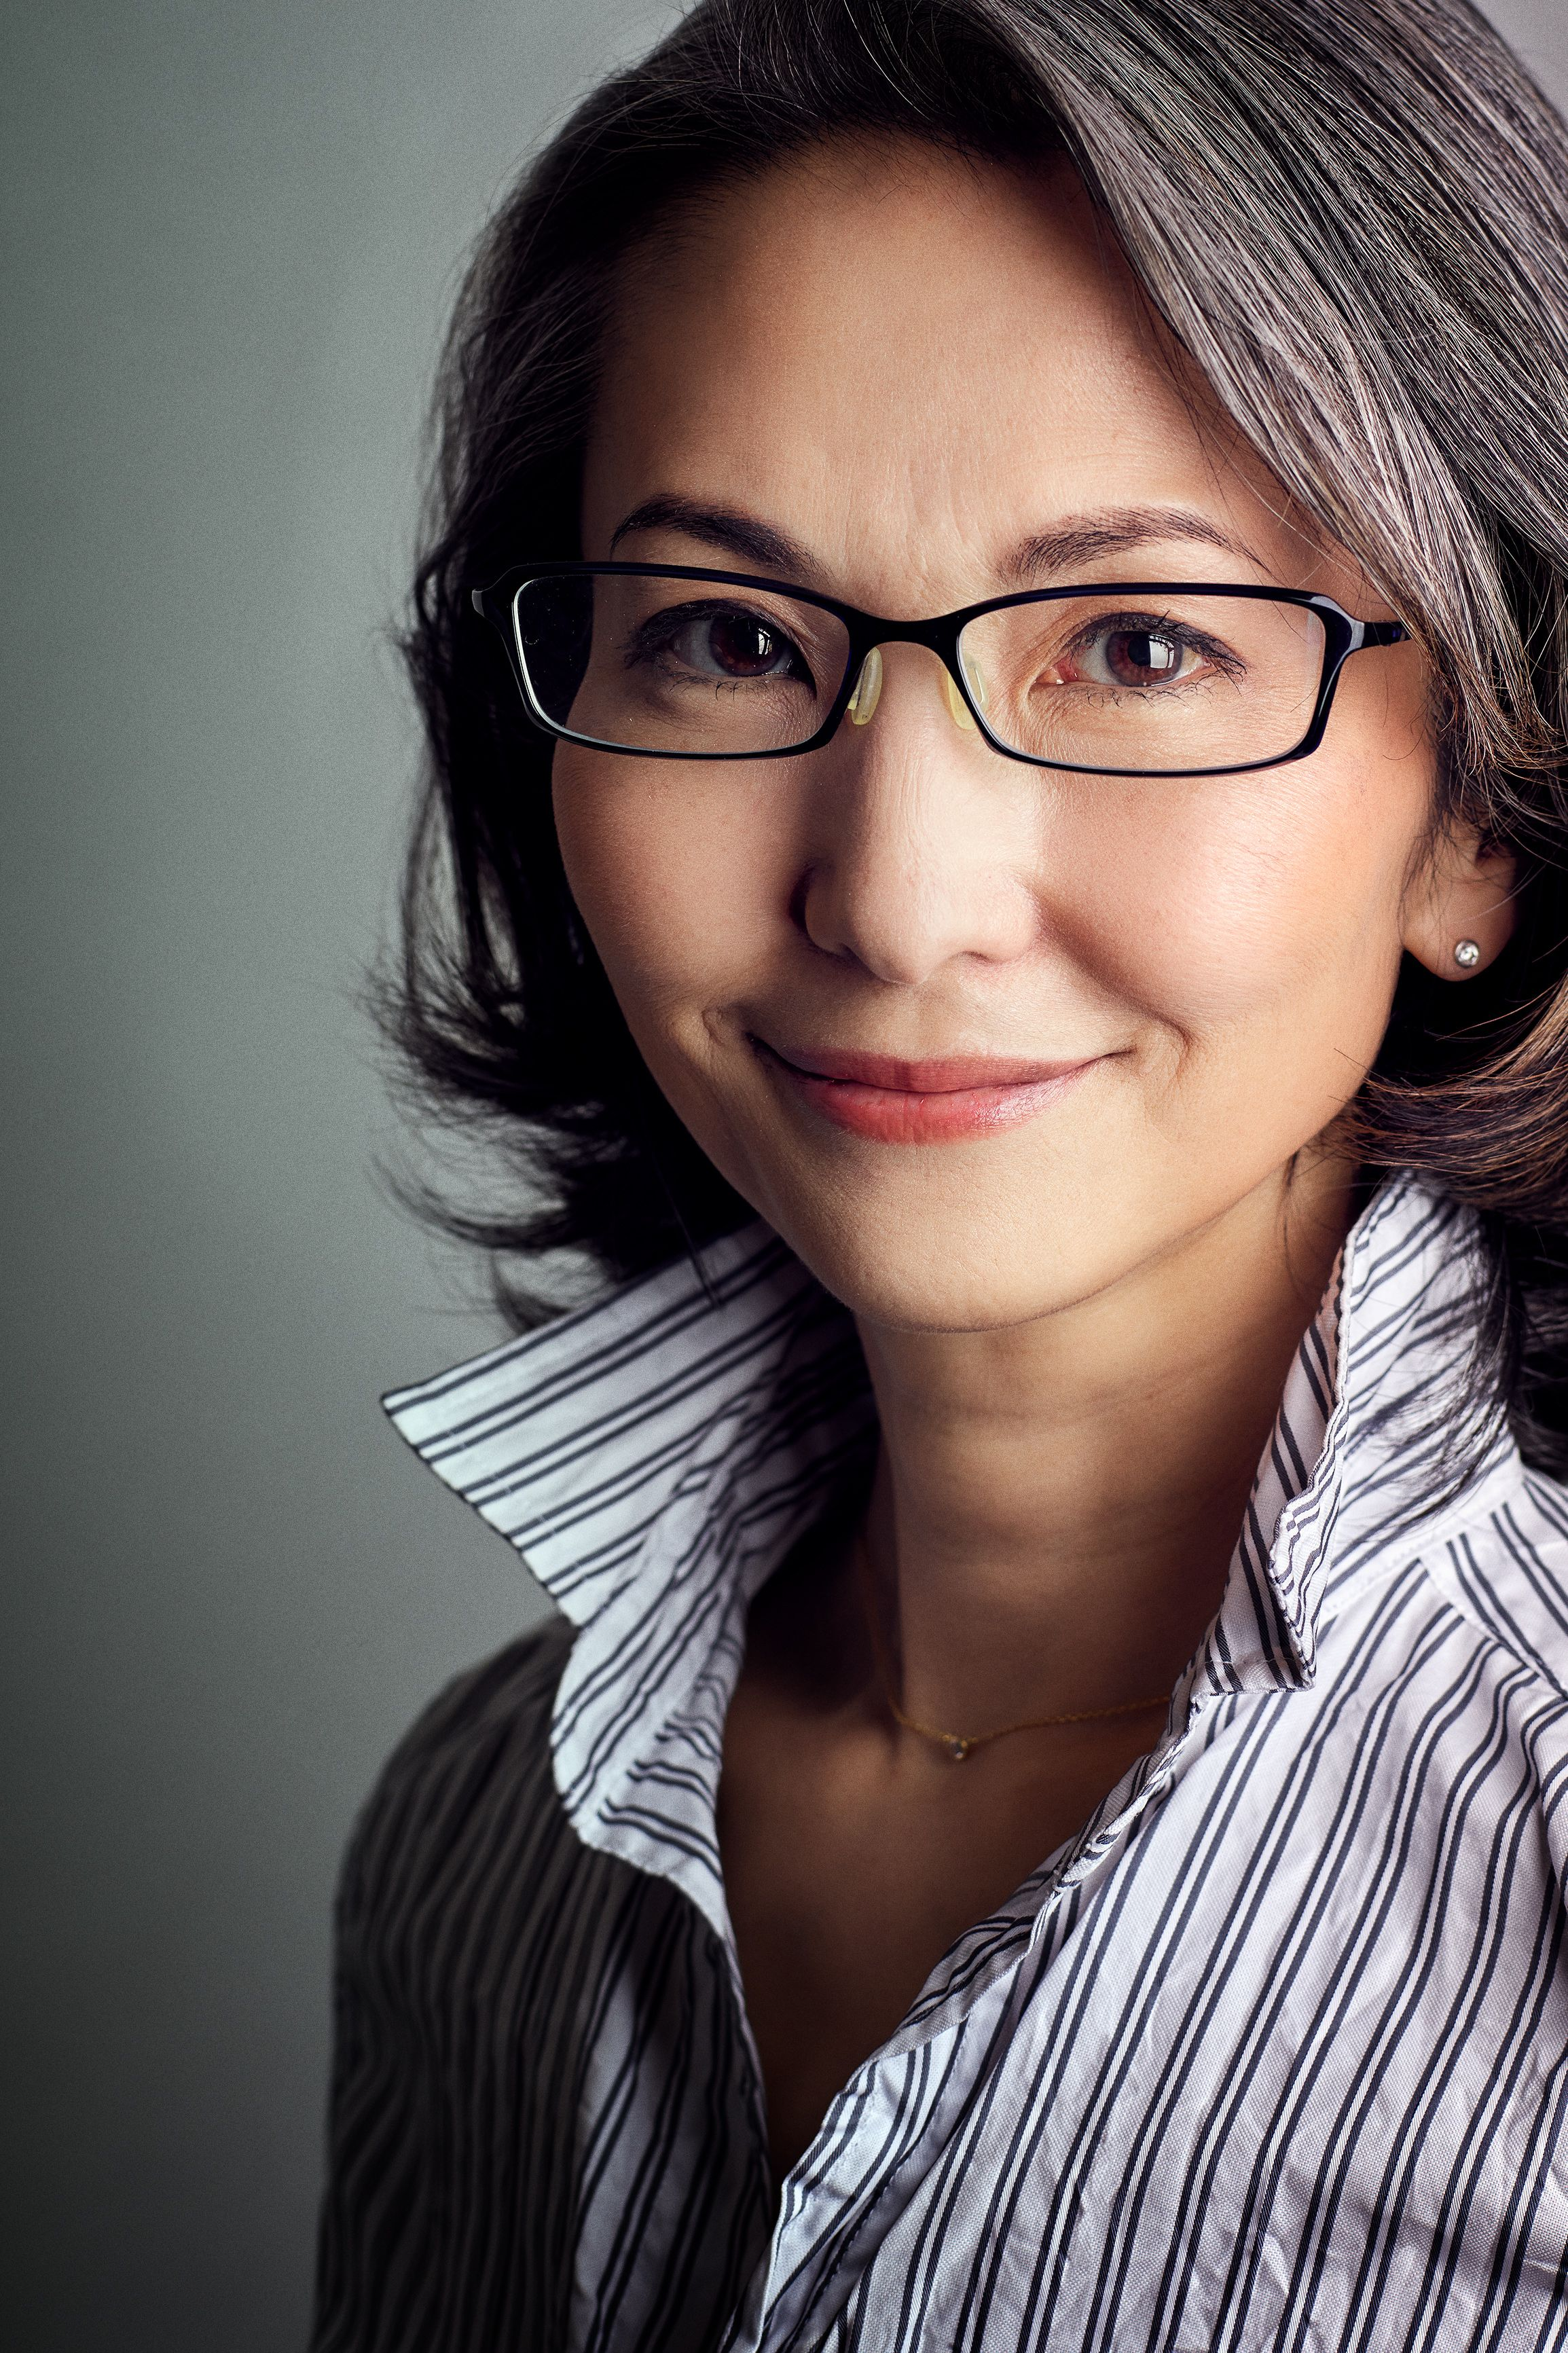 Mayuko from Japan 0ver50 GrayHairStyle Grey Grace